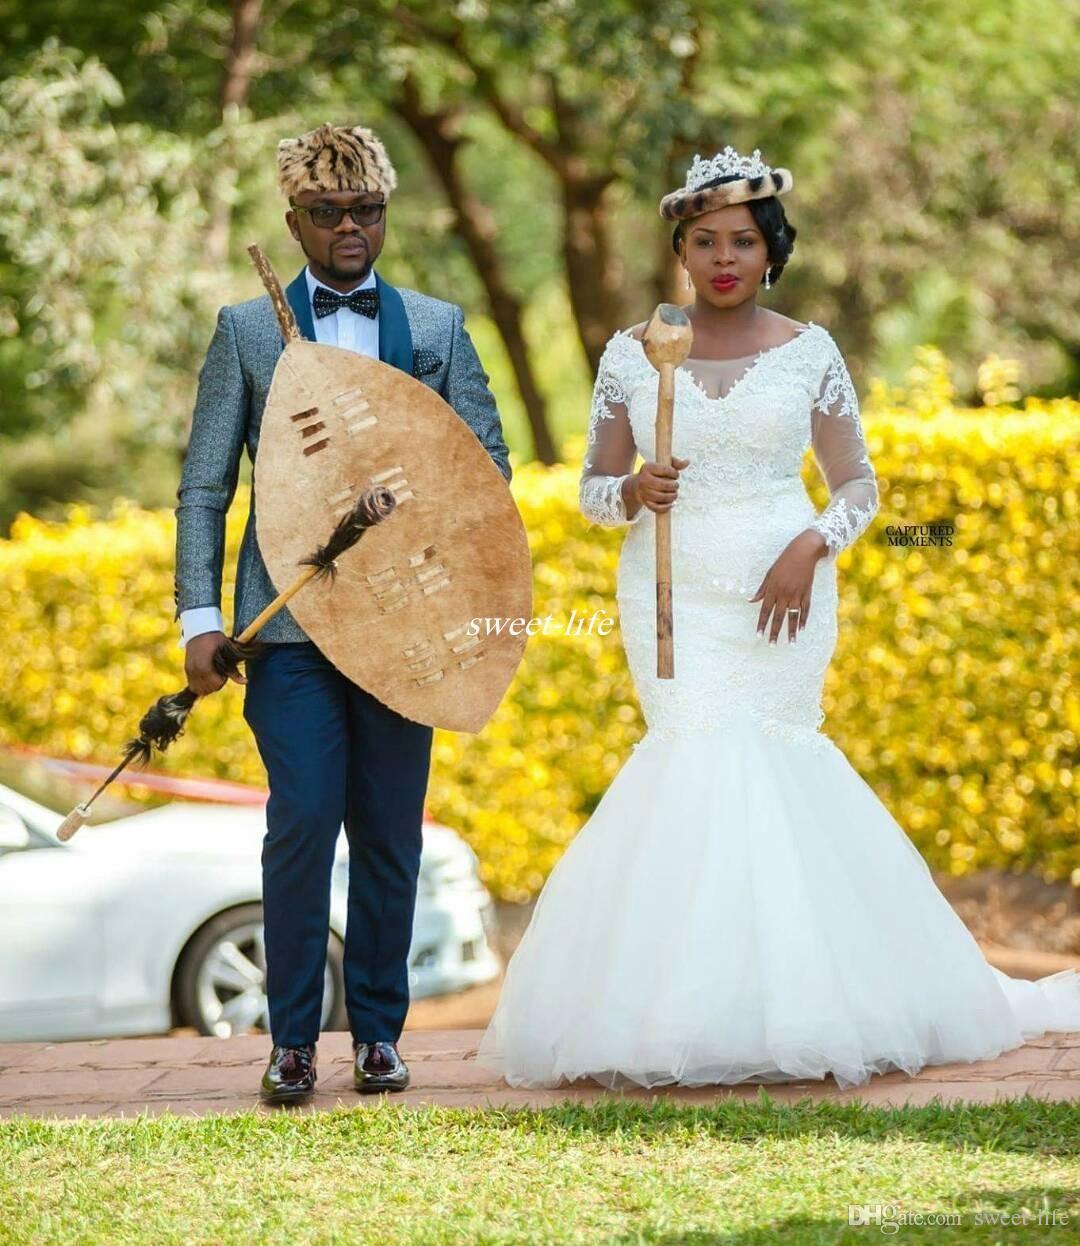 Long Sleeve Plus Size Wedding Dresses Mermaid Sheer Bateau Neckline Lace Sweep Train Tulle 2017 Outdoor Vintage Afracia Bridal Wedding Gowns